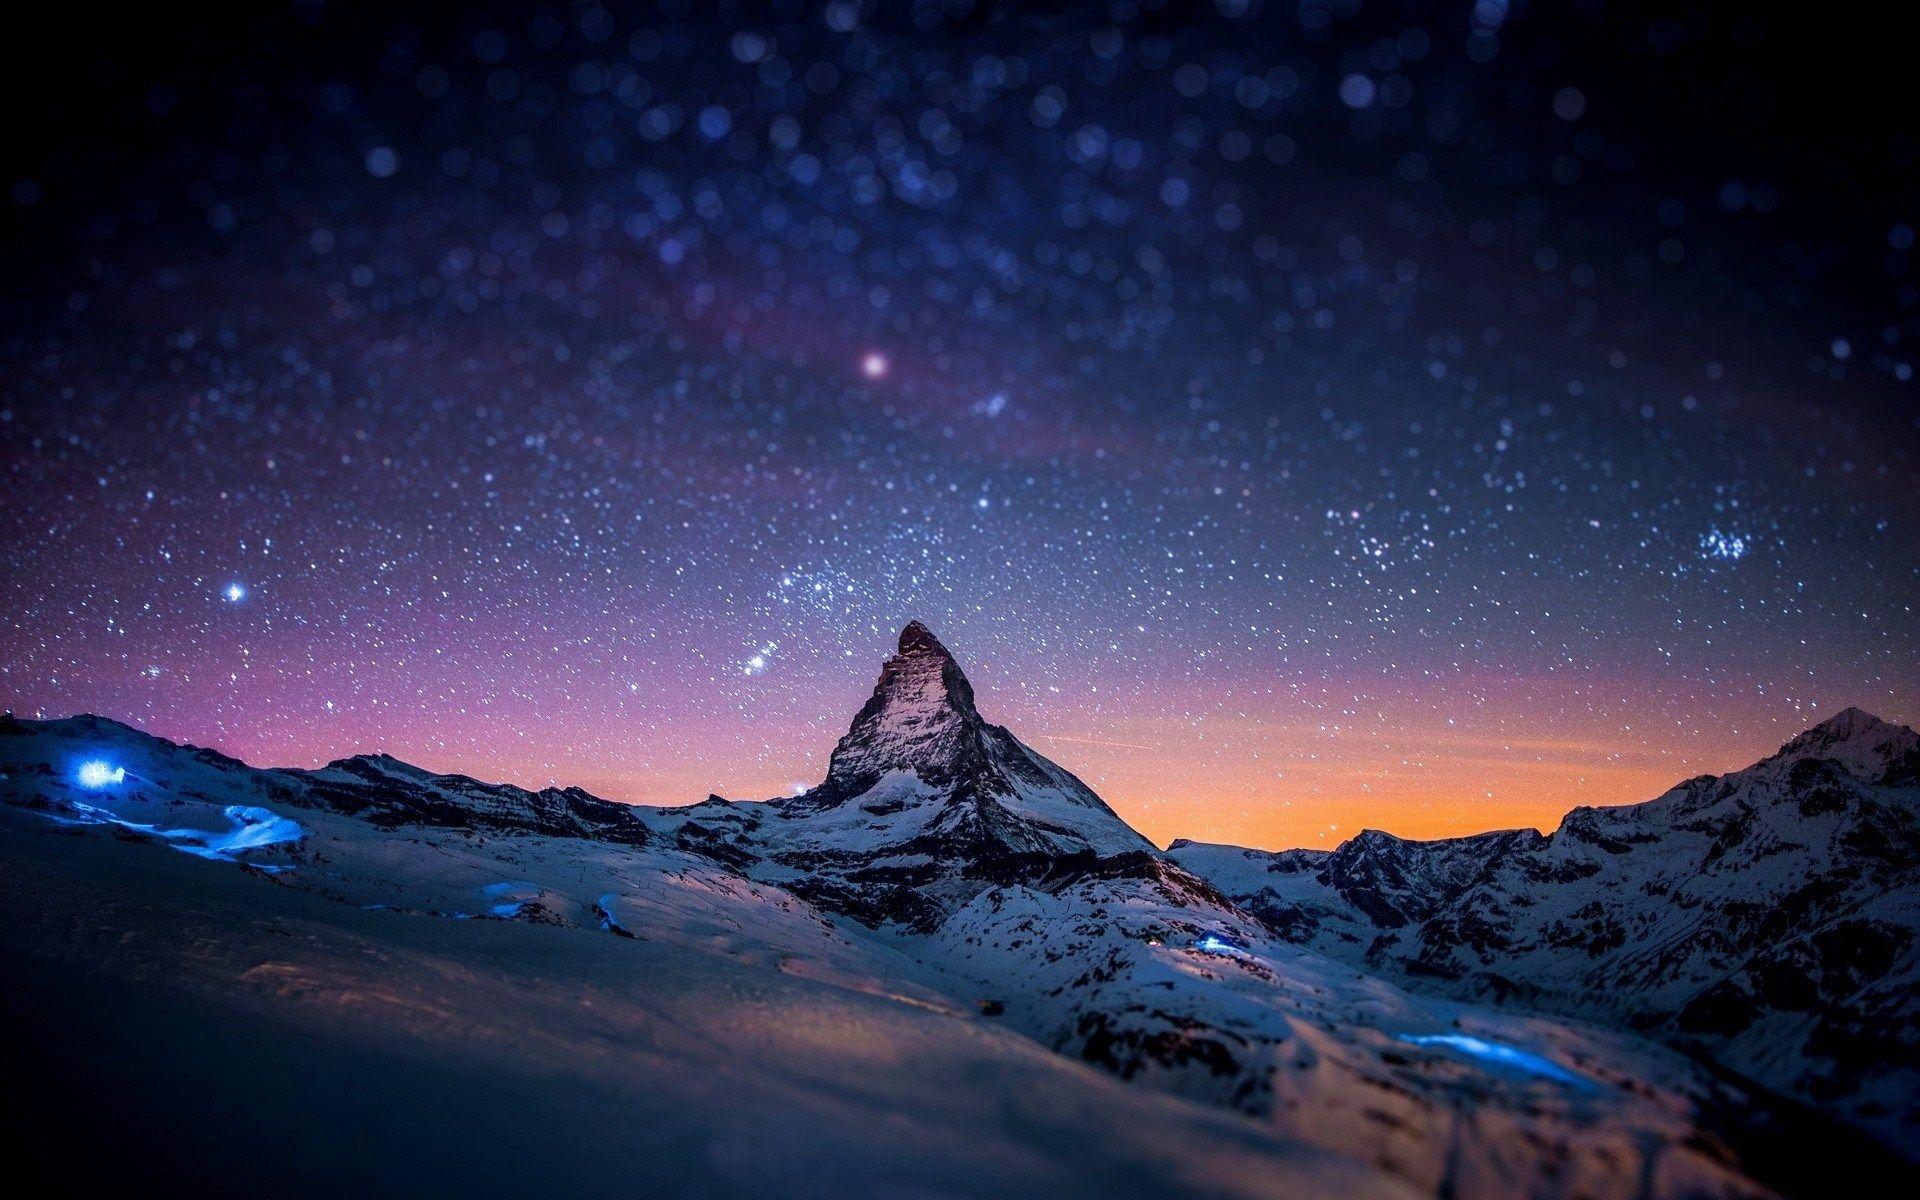 night sky desktop wallpaper free